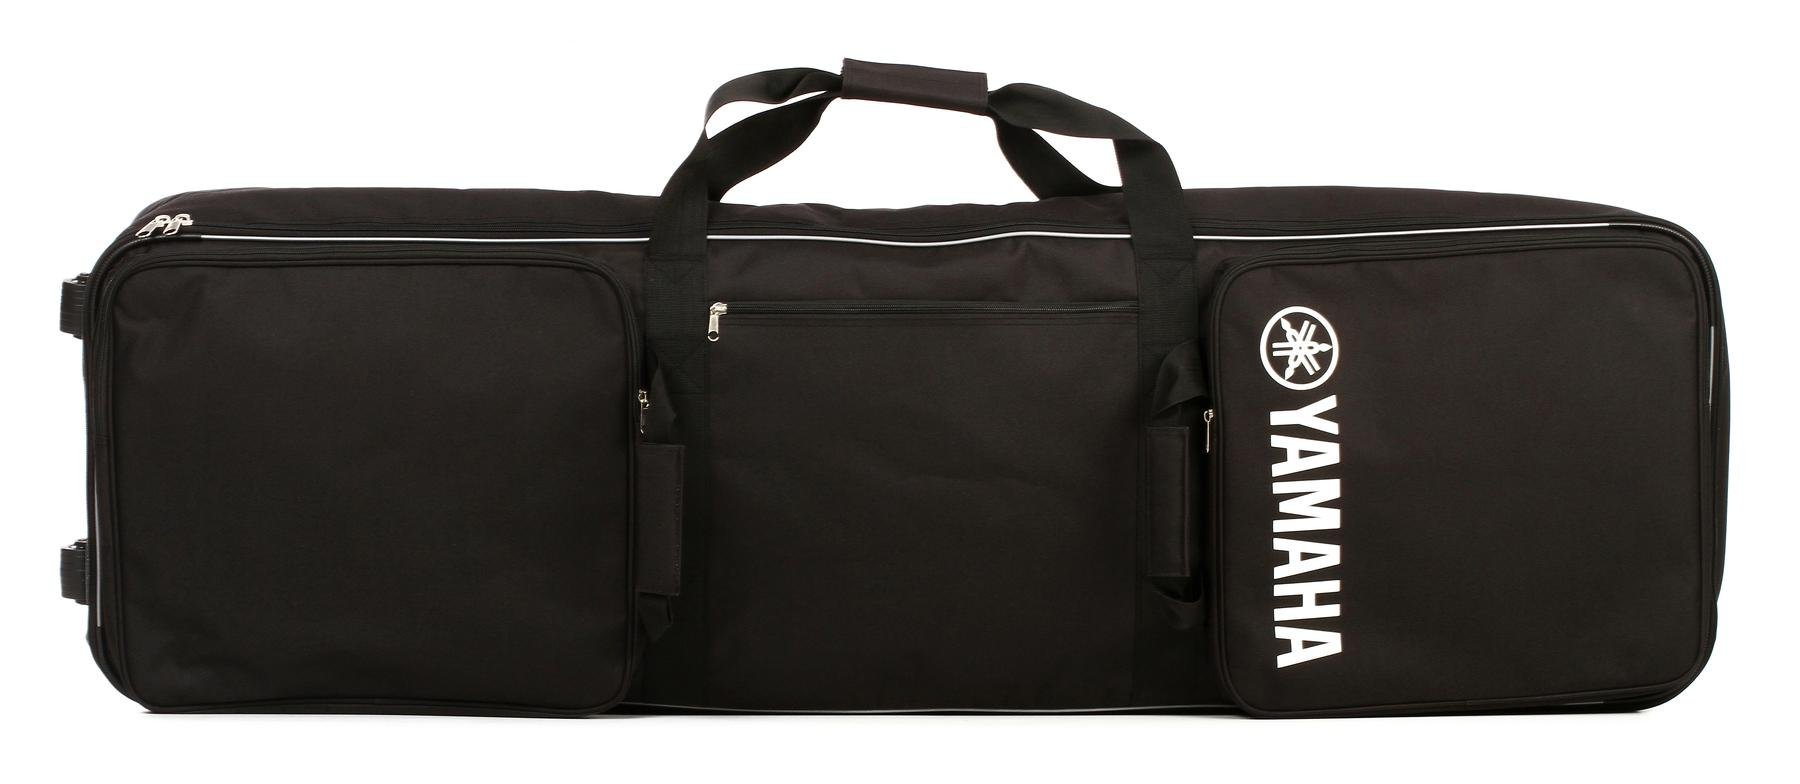 Yamaha Padded Bag with Wheels for - YSCMOXF8-MX88